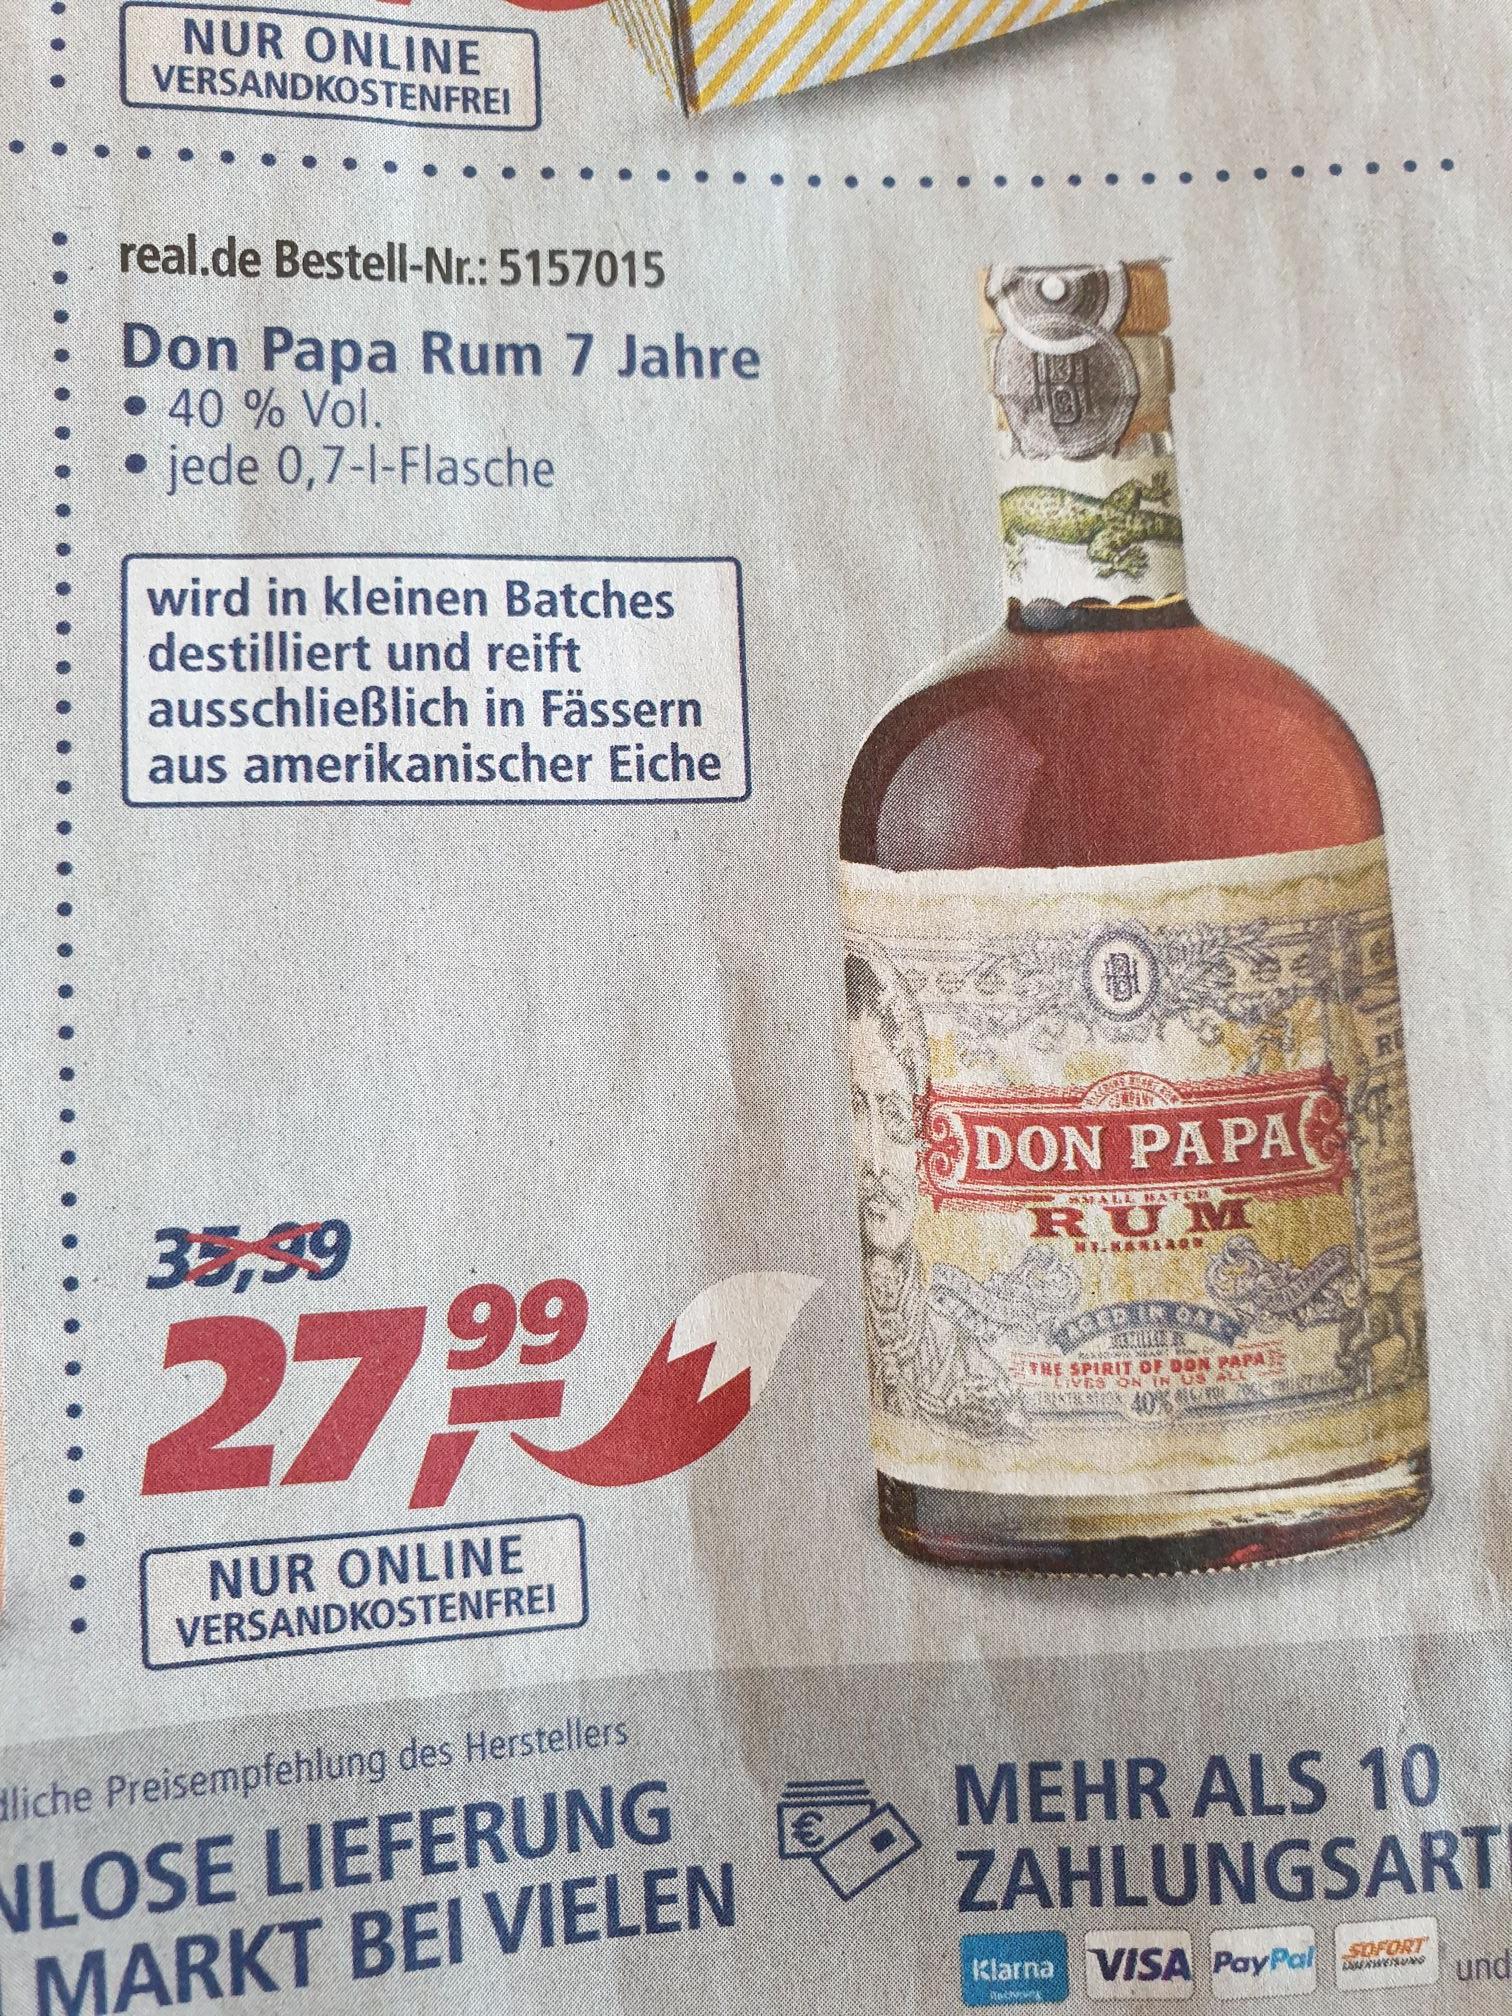 Don papa Rum 0,7l inklusive Versand